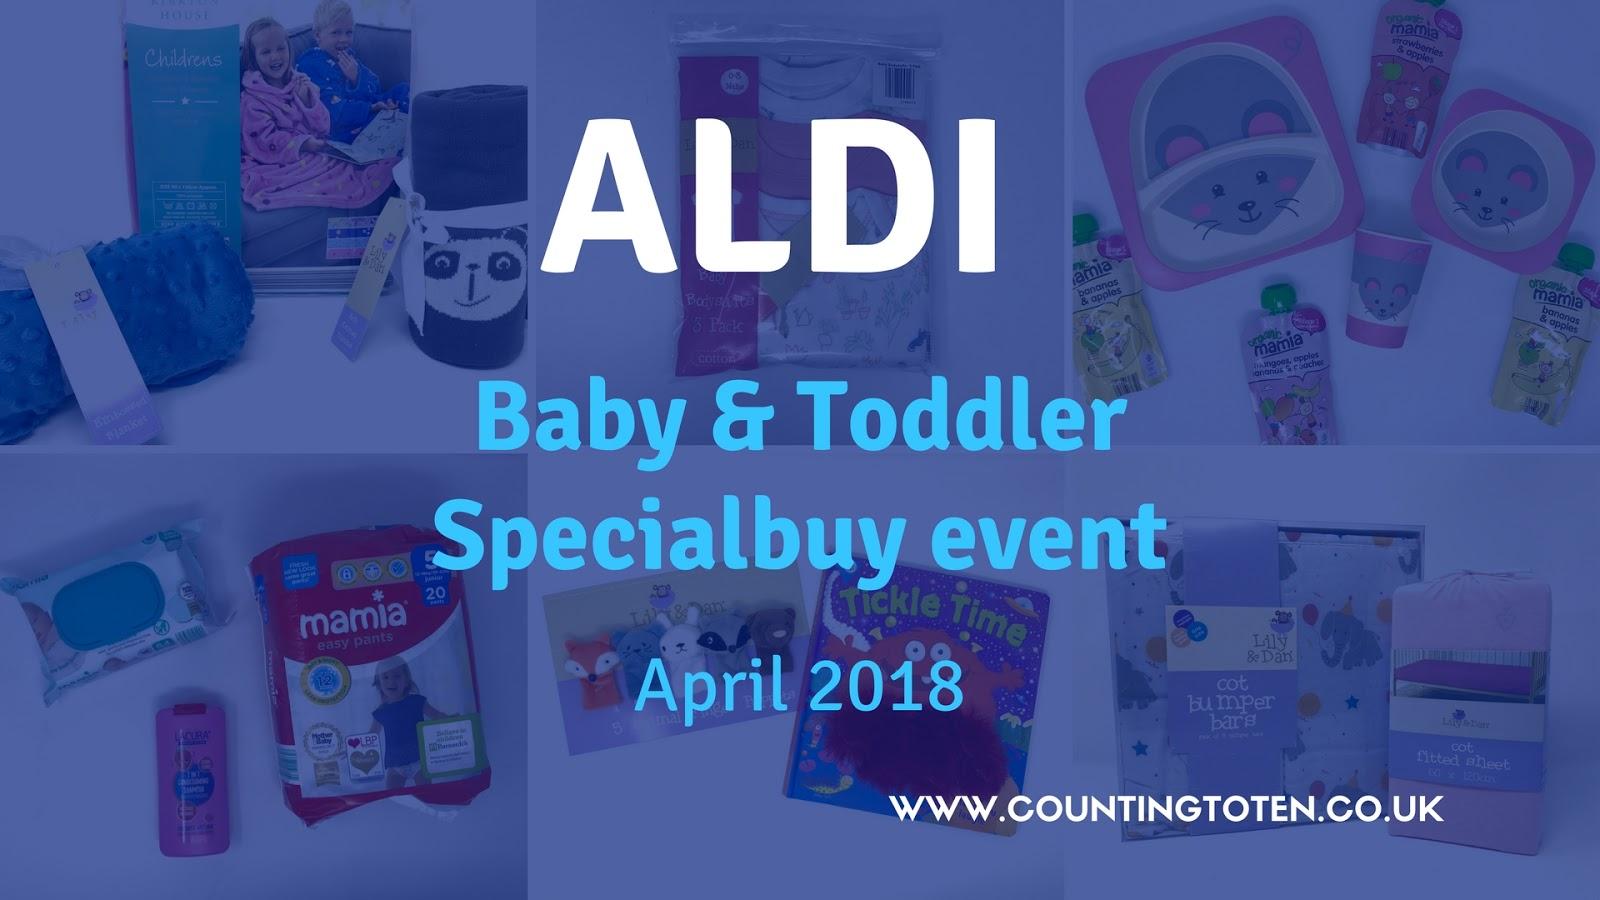 aldi baby toddler specialbuy event april 2018 counting. Black Bedroom Furniture Sets. Home Design Ideas